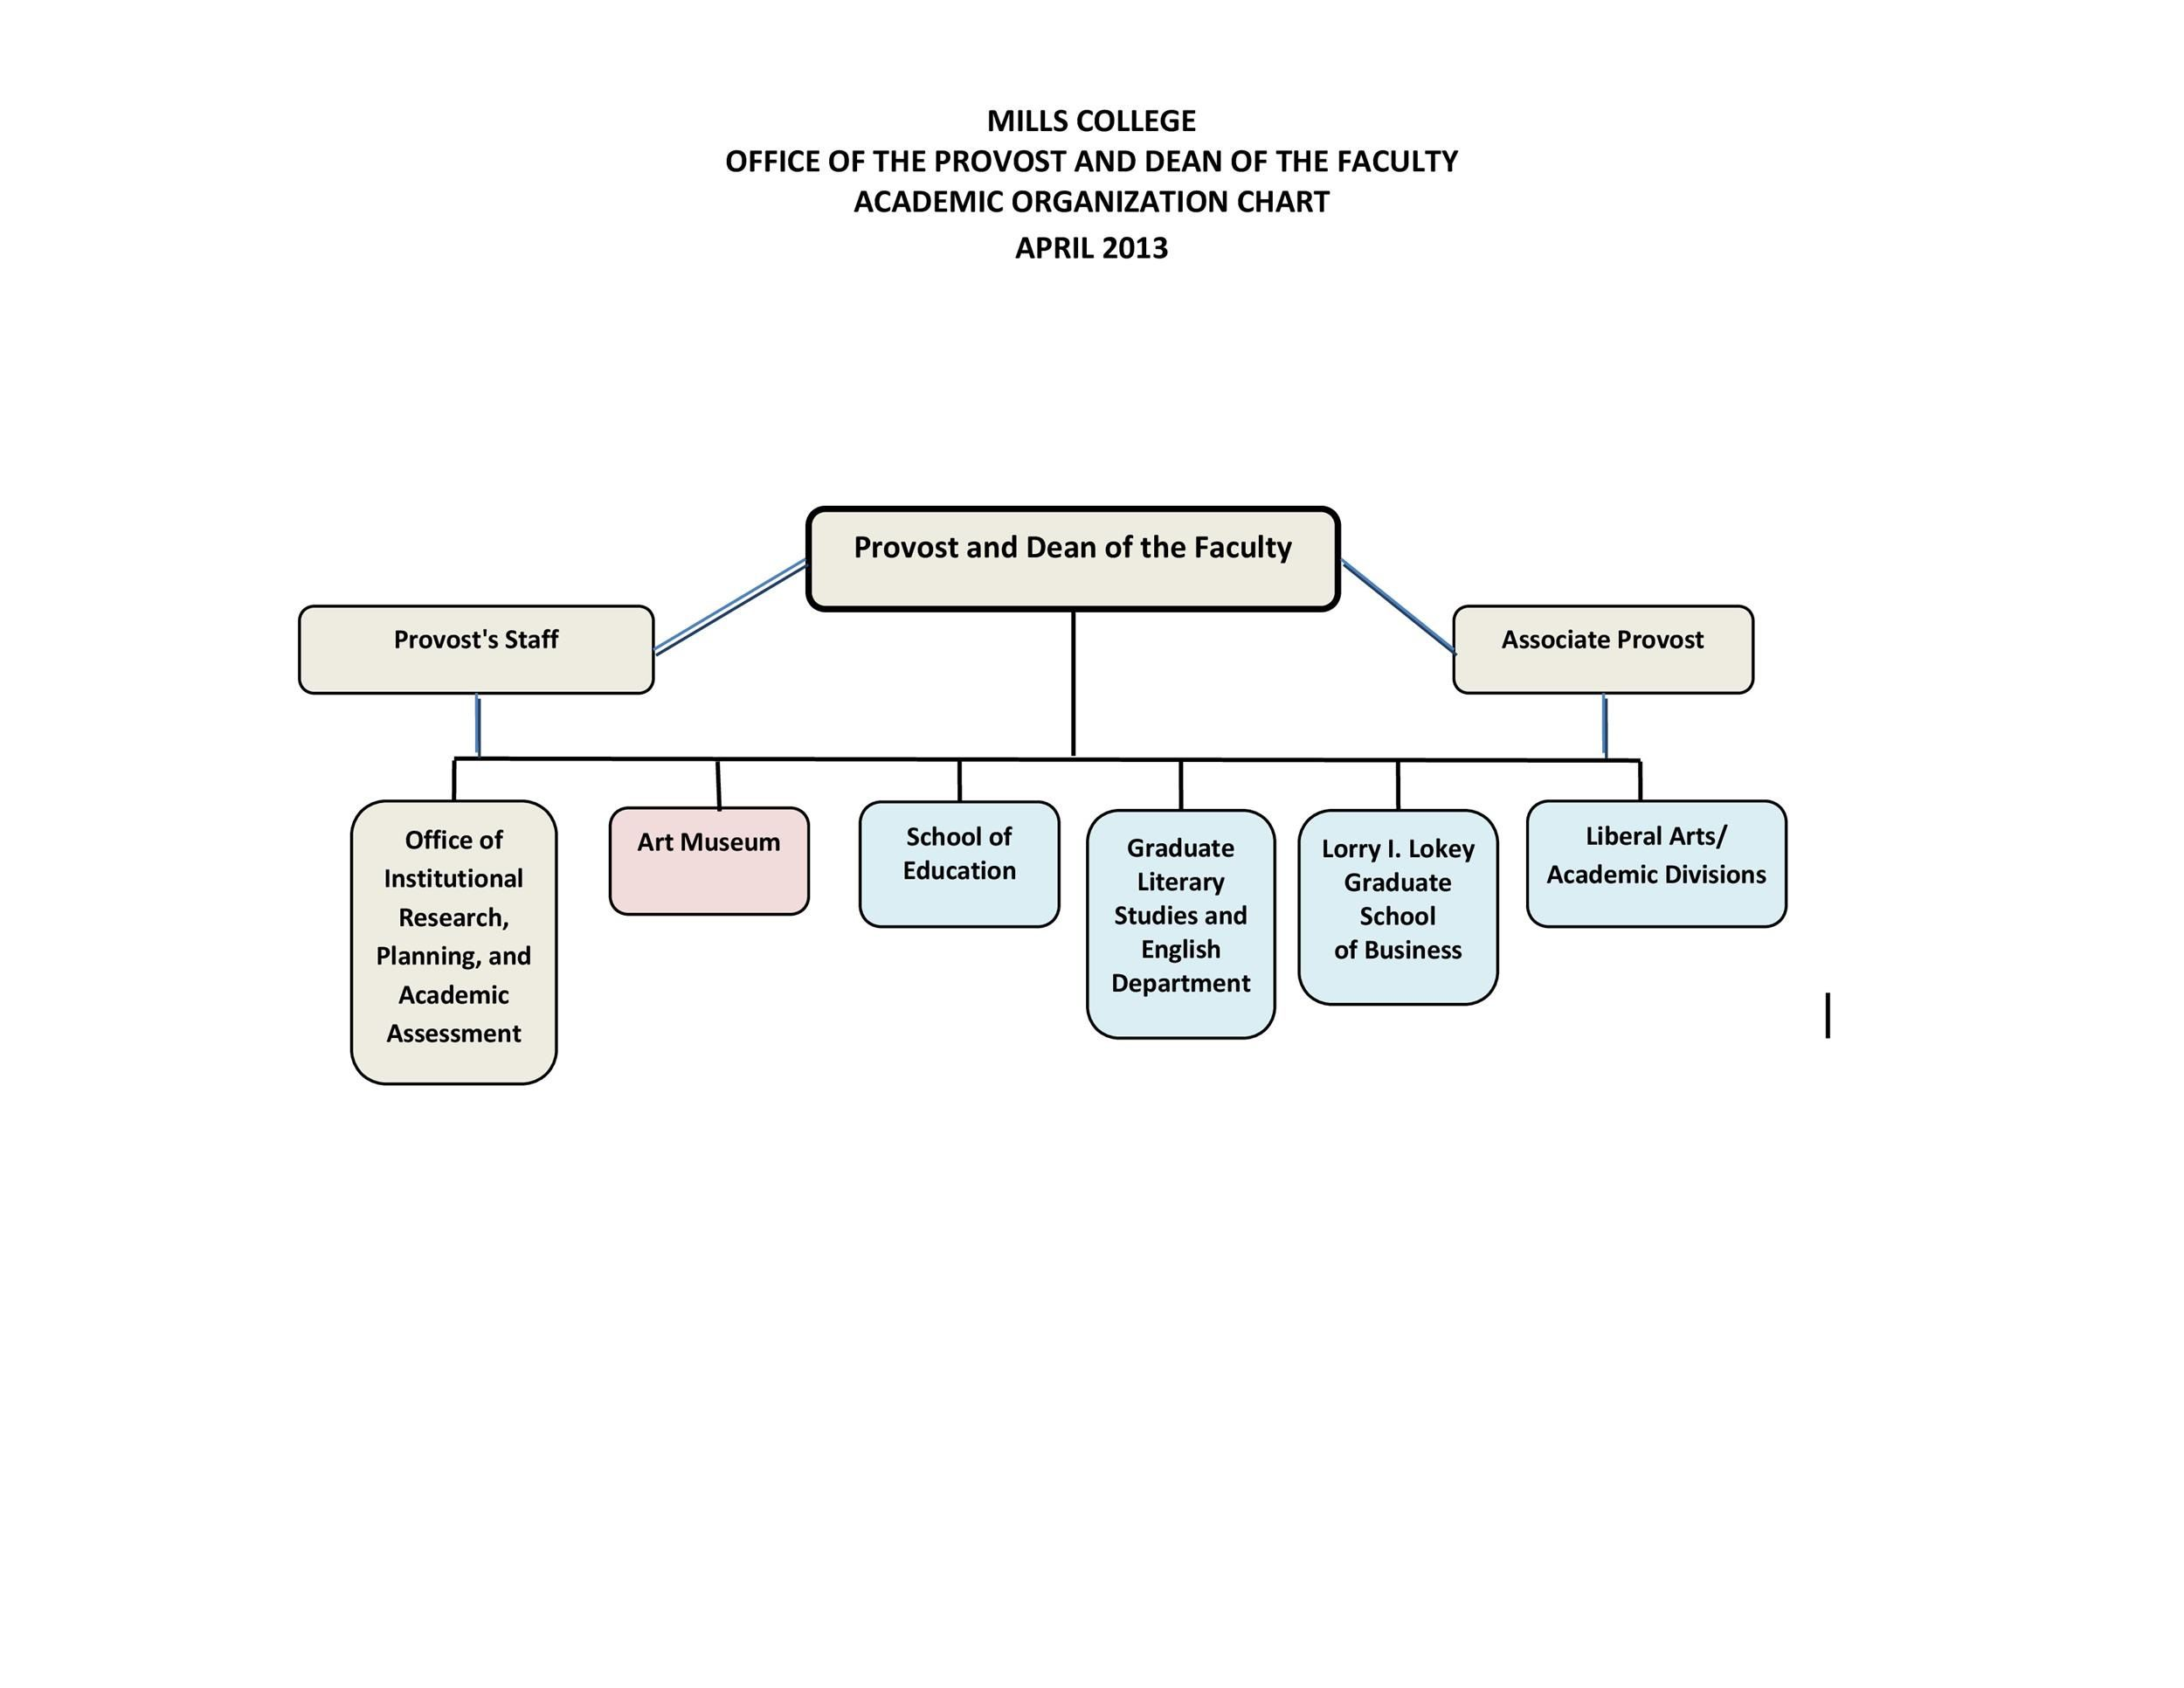 006 Rare Org Chart Template Excel 2013 Sample  OrganizationalFull